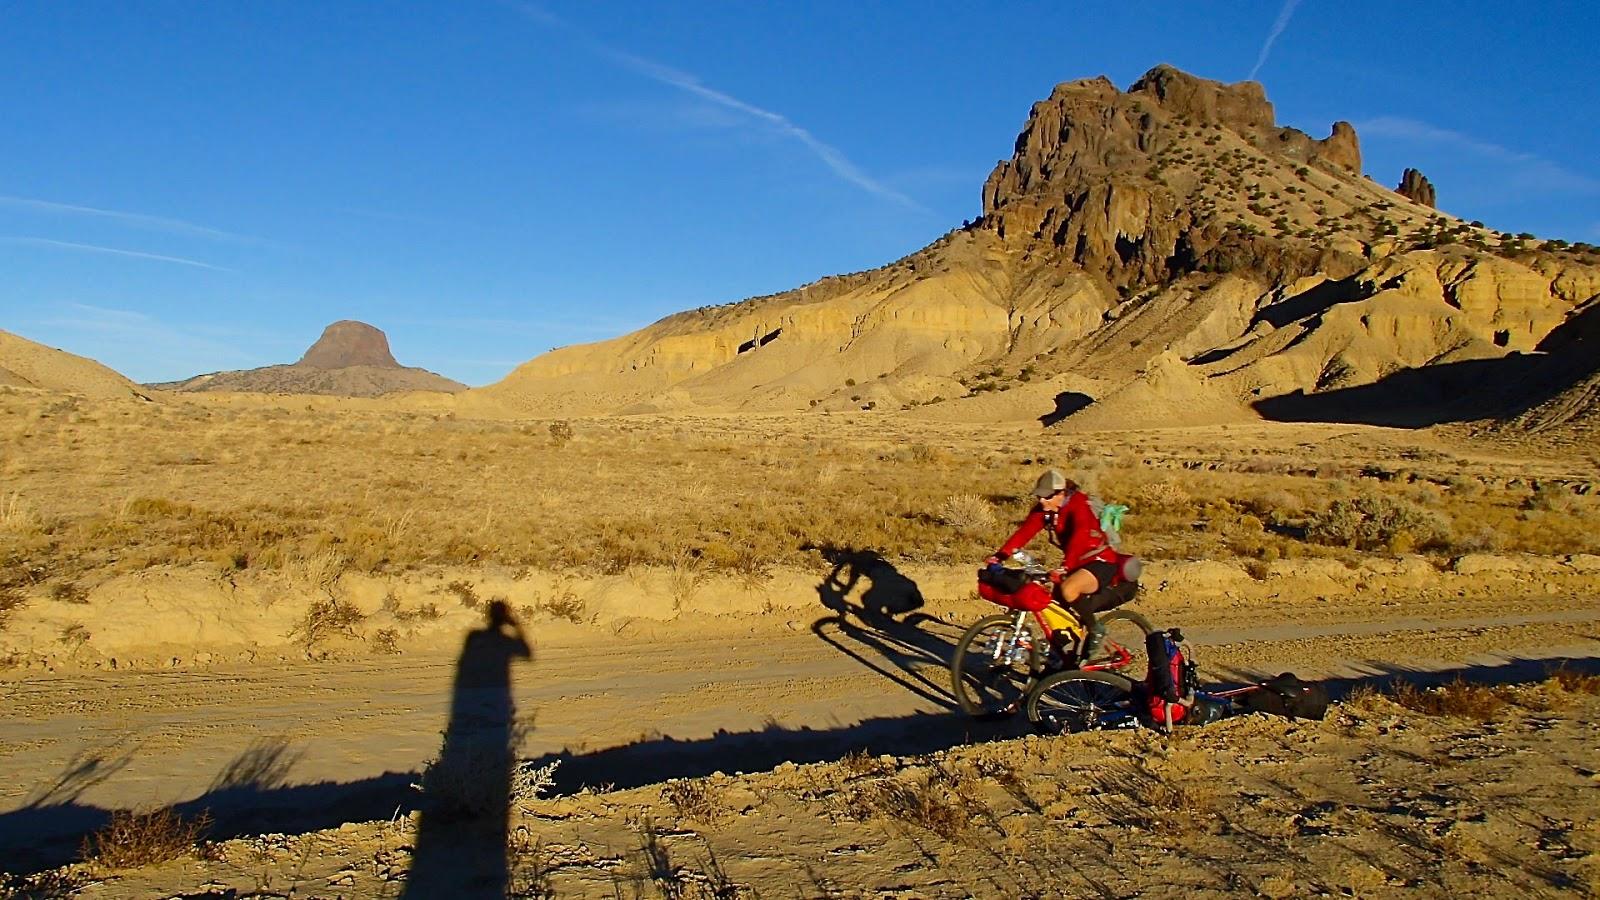 rio puerco and arroyo chico bikepacking cranksgiving 2014